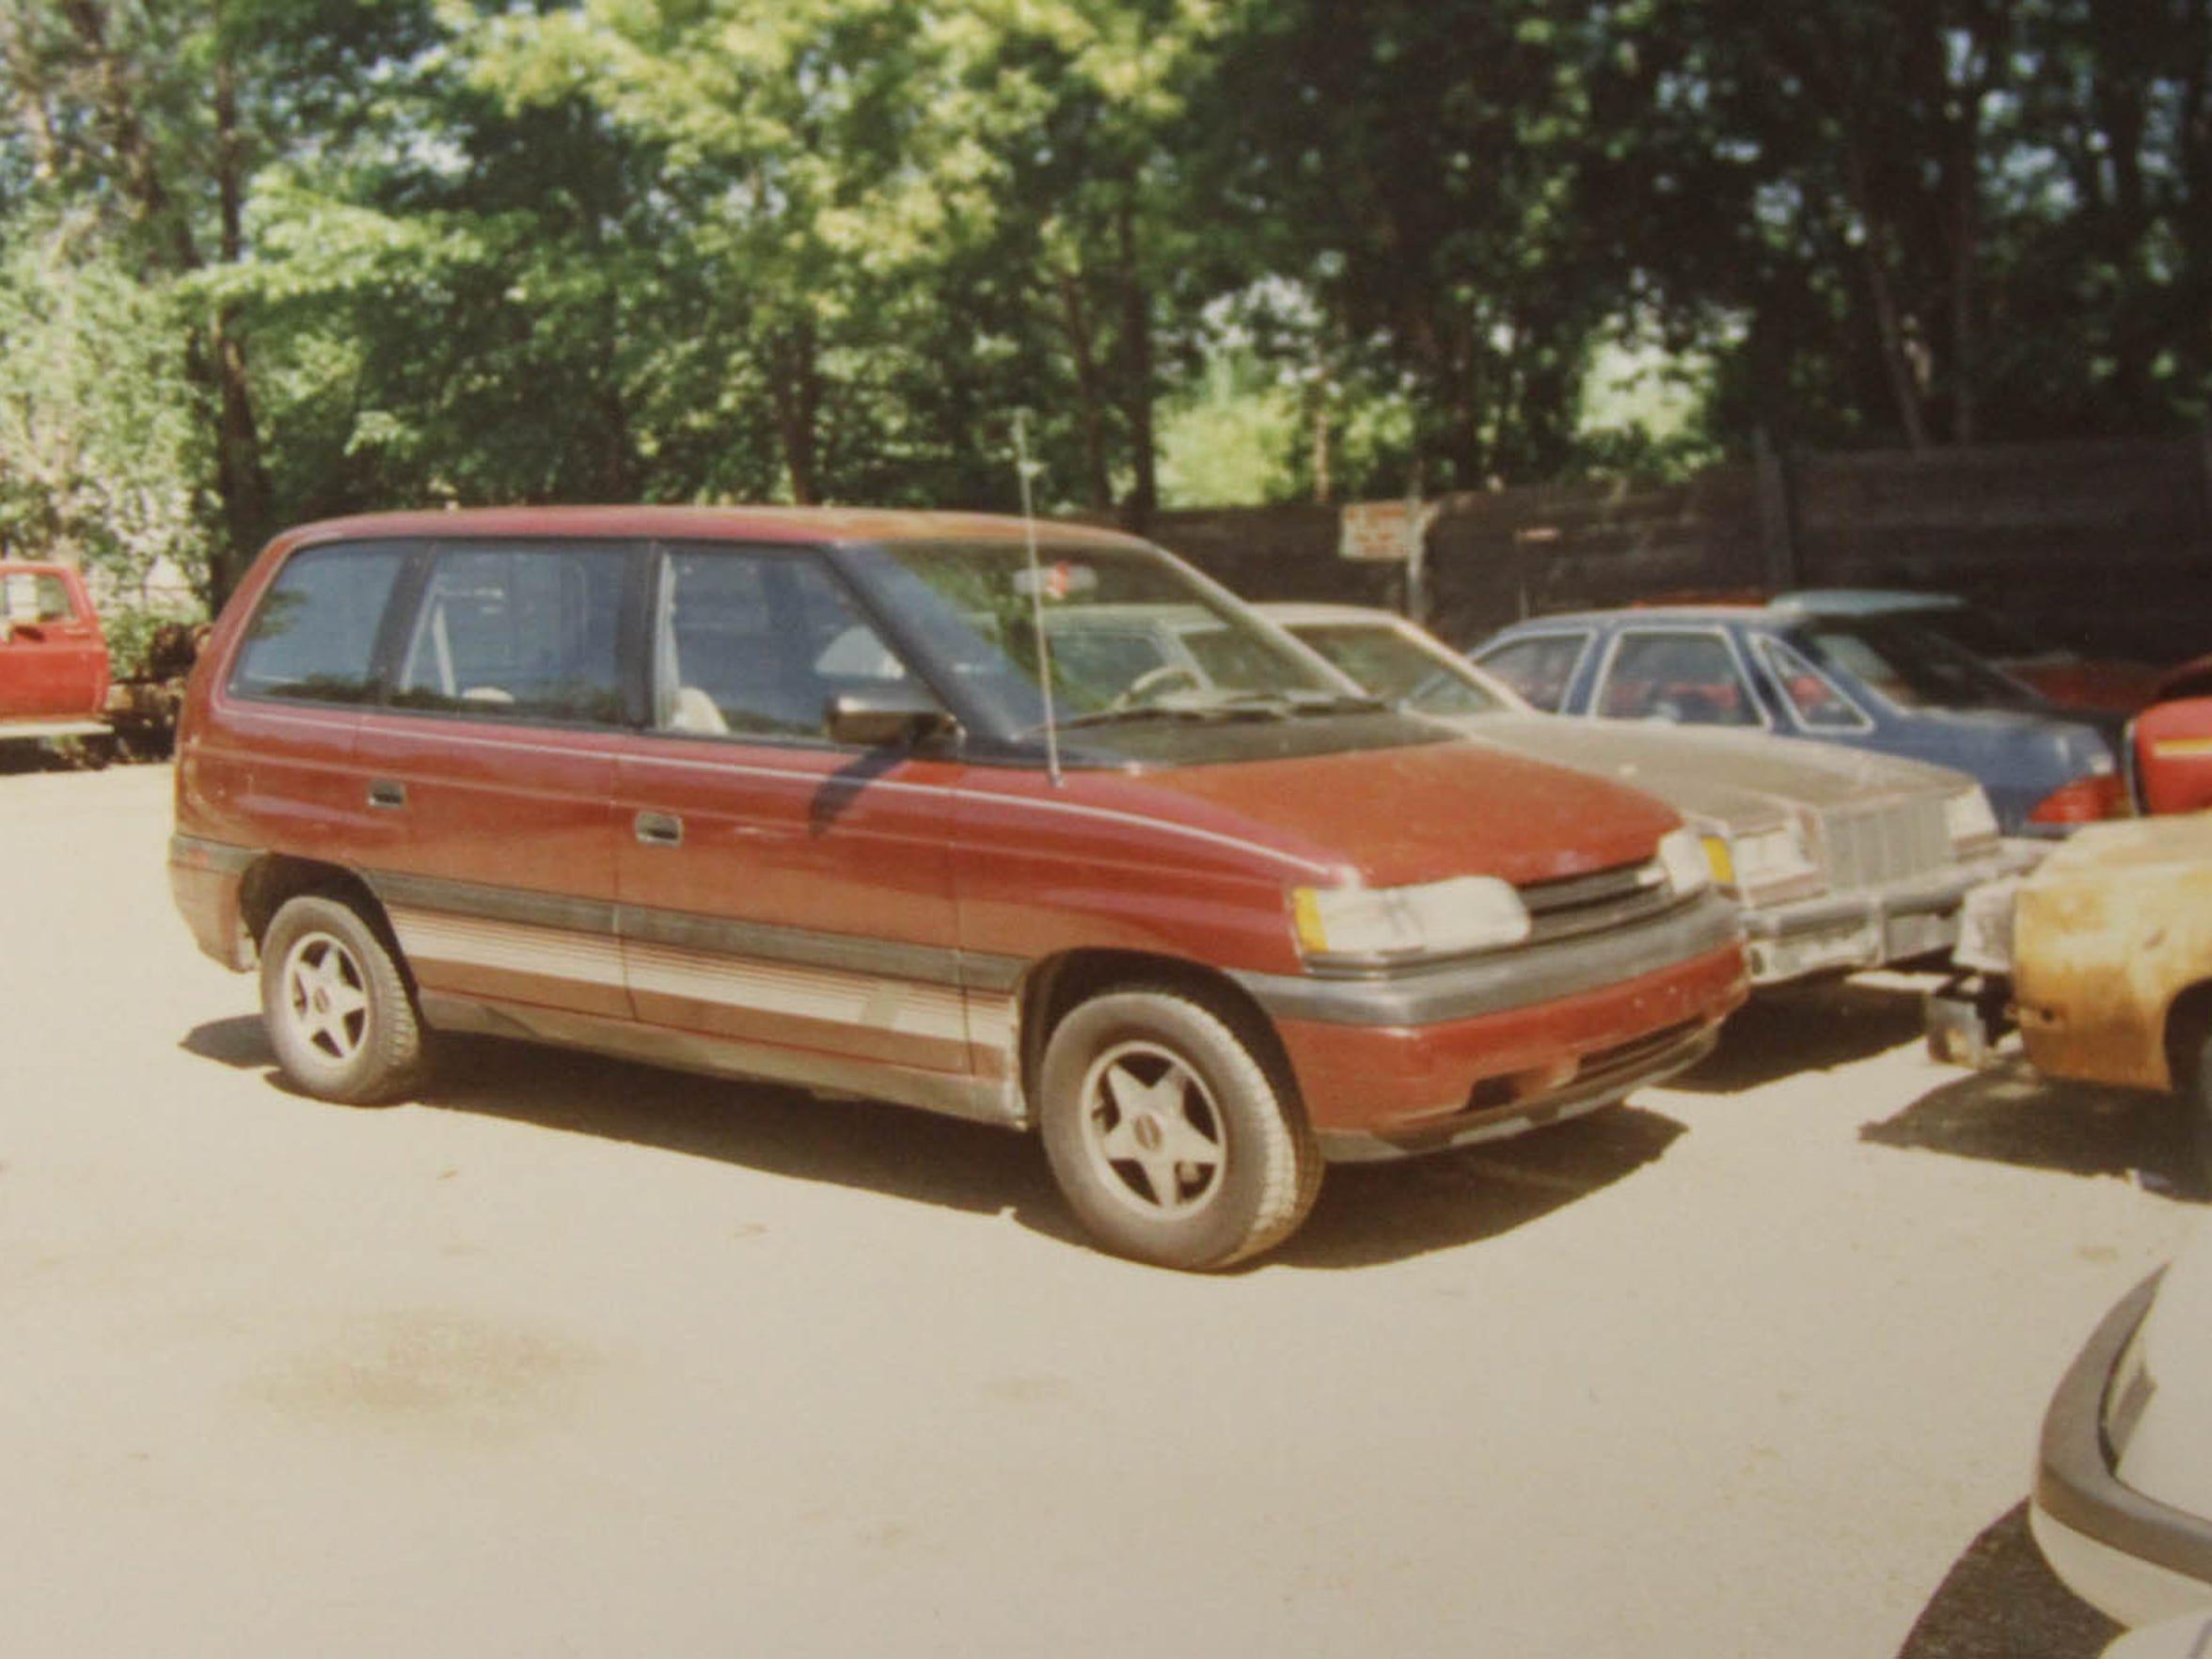 similar vehicle seen with.jpeg